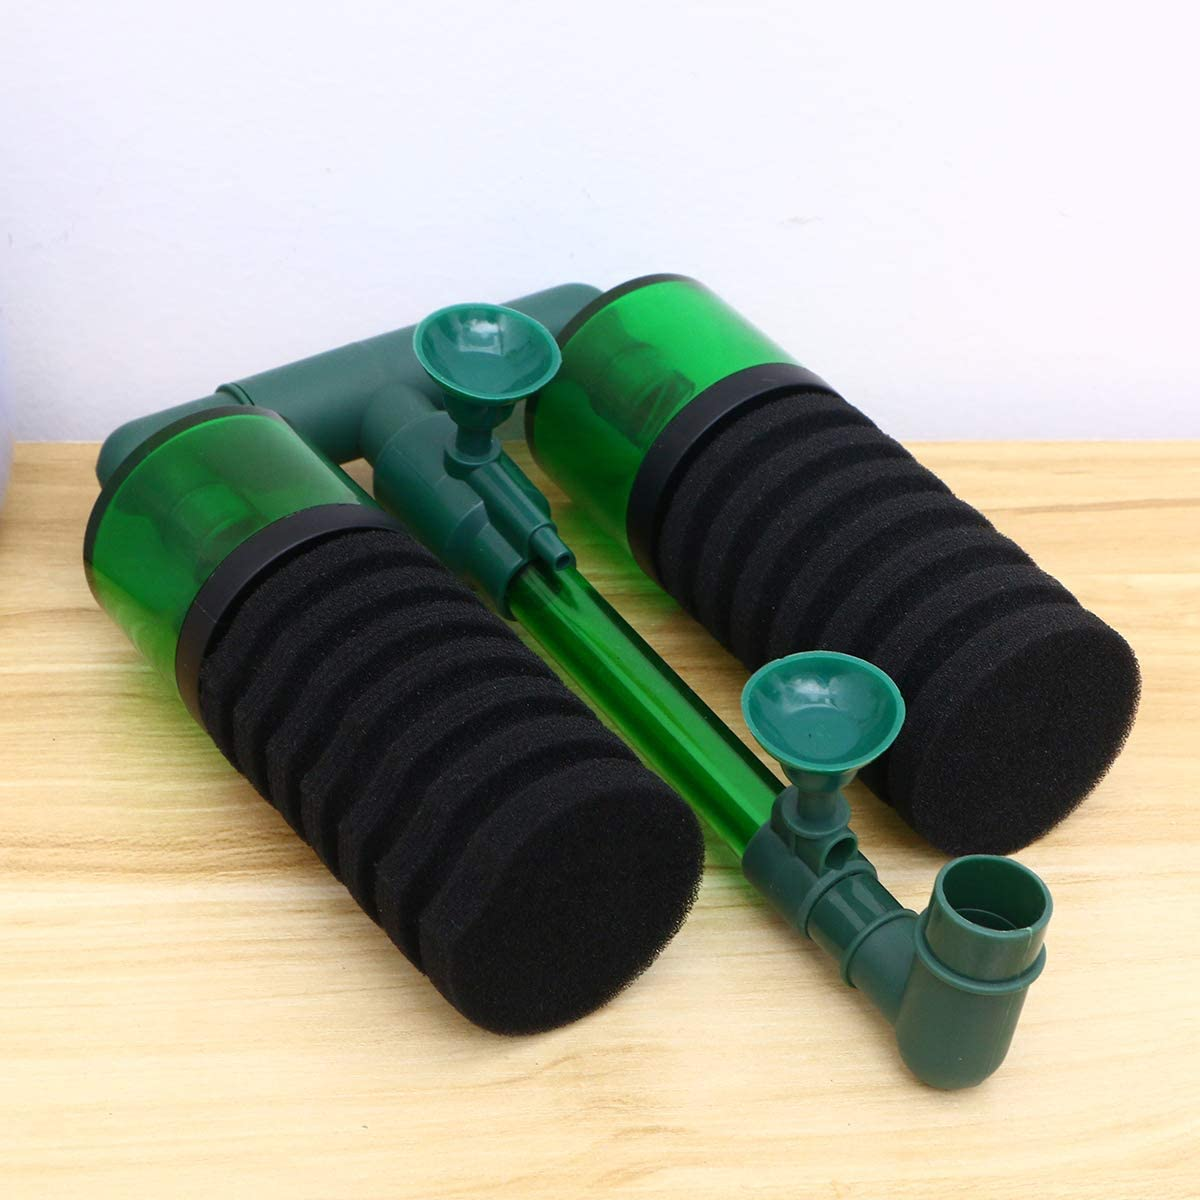 POPETPOP Filtro de Esponjas Bioqu/ímicas de Cabeza Doble Bomba de Aire con Ventosa para Acuario